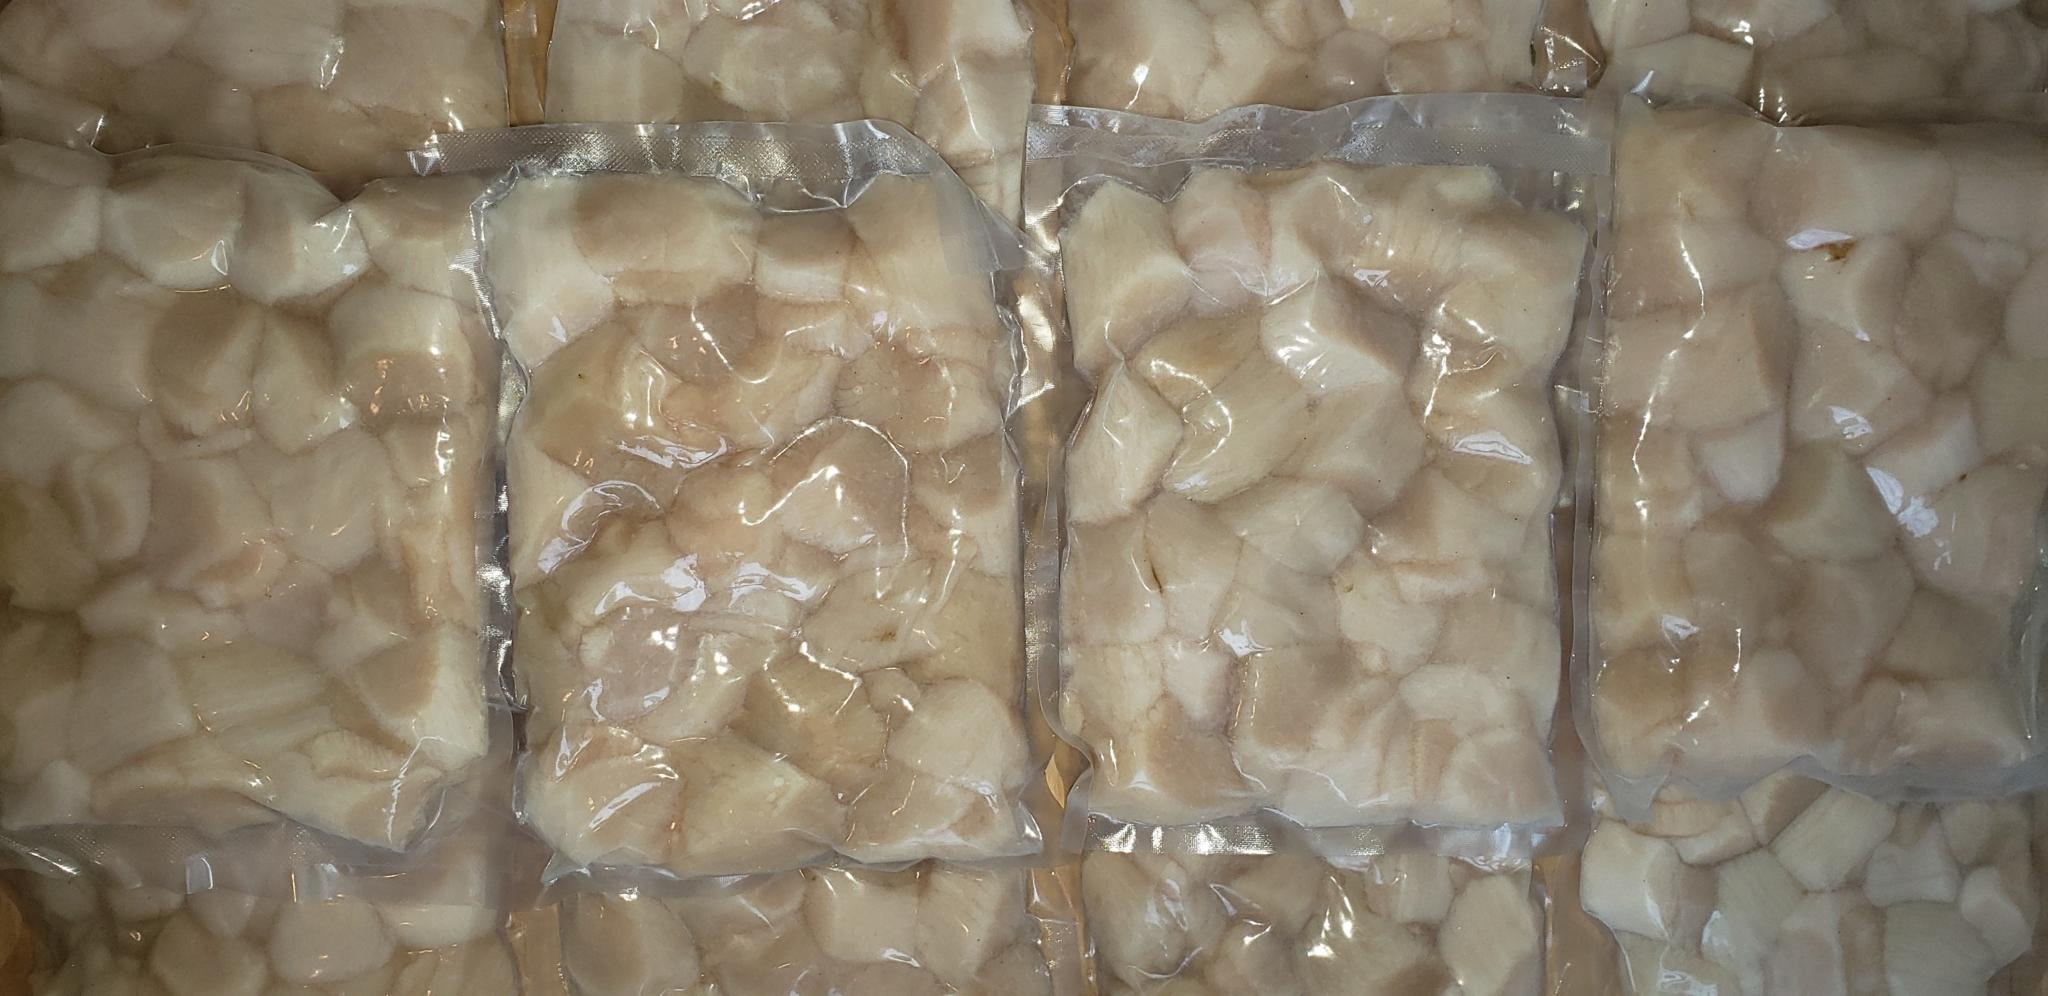 Fruits de mer des iles de la madeleine